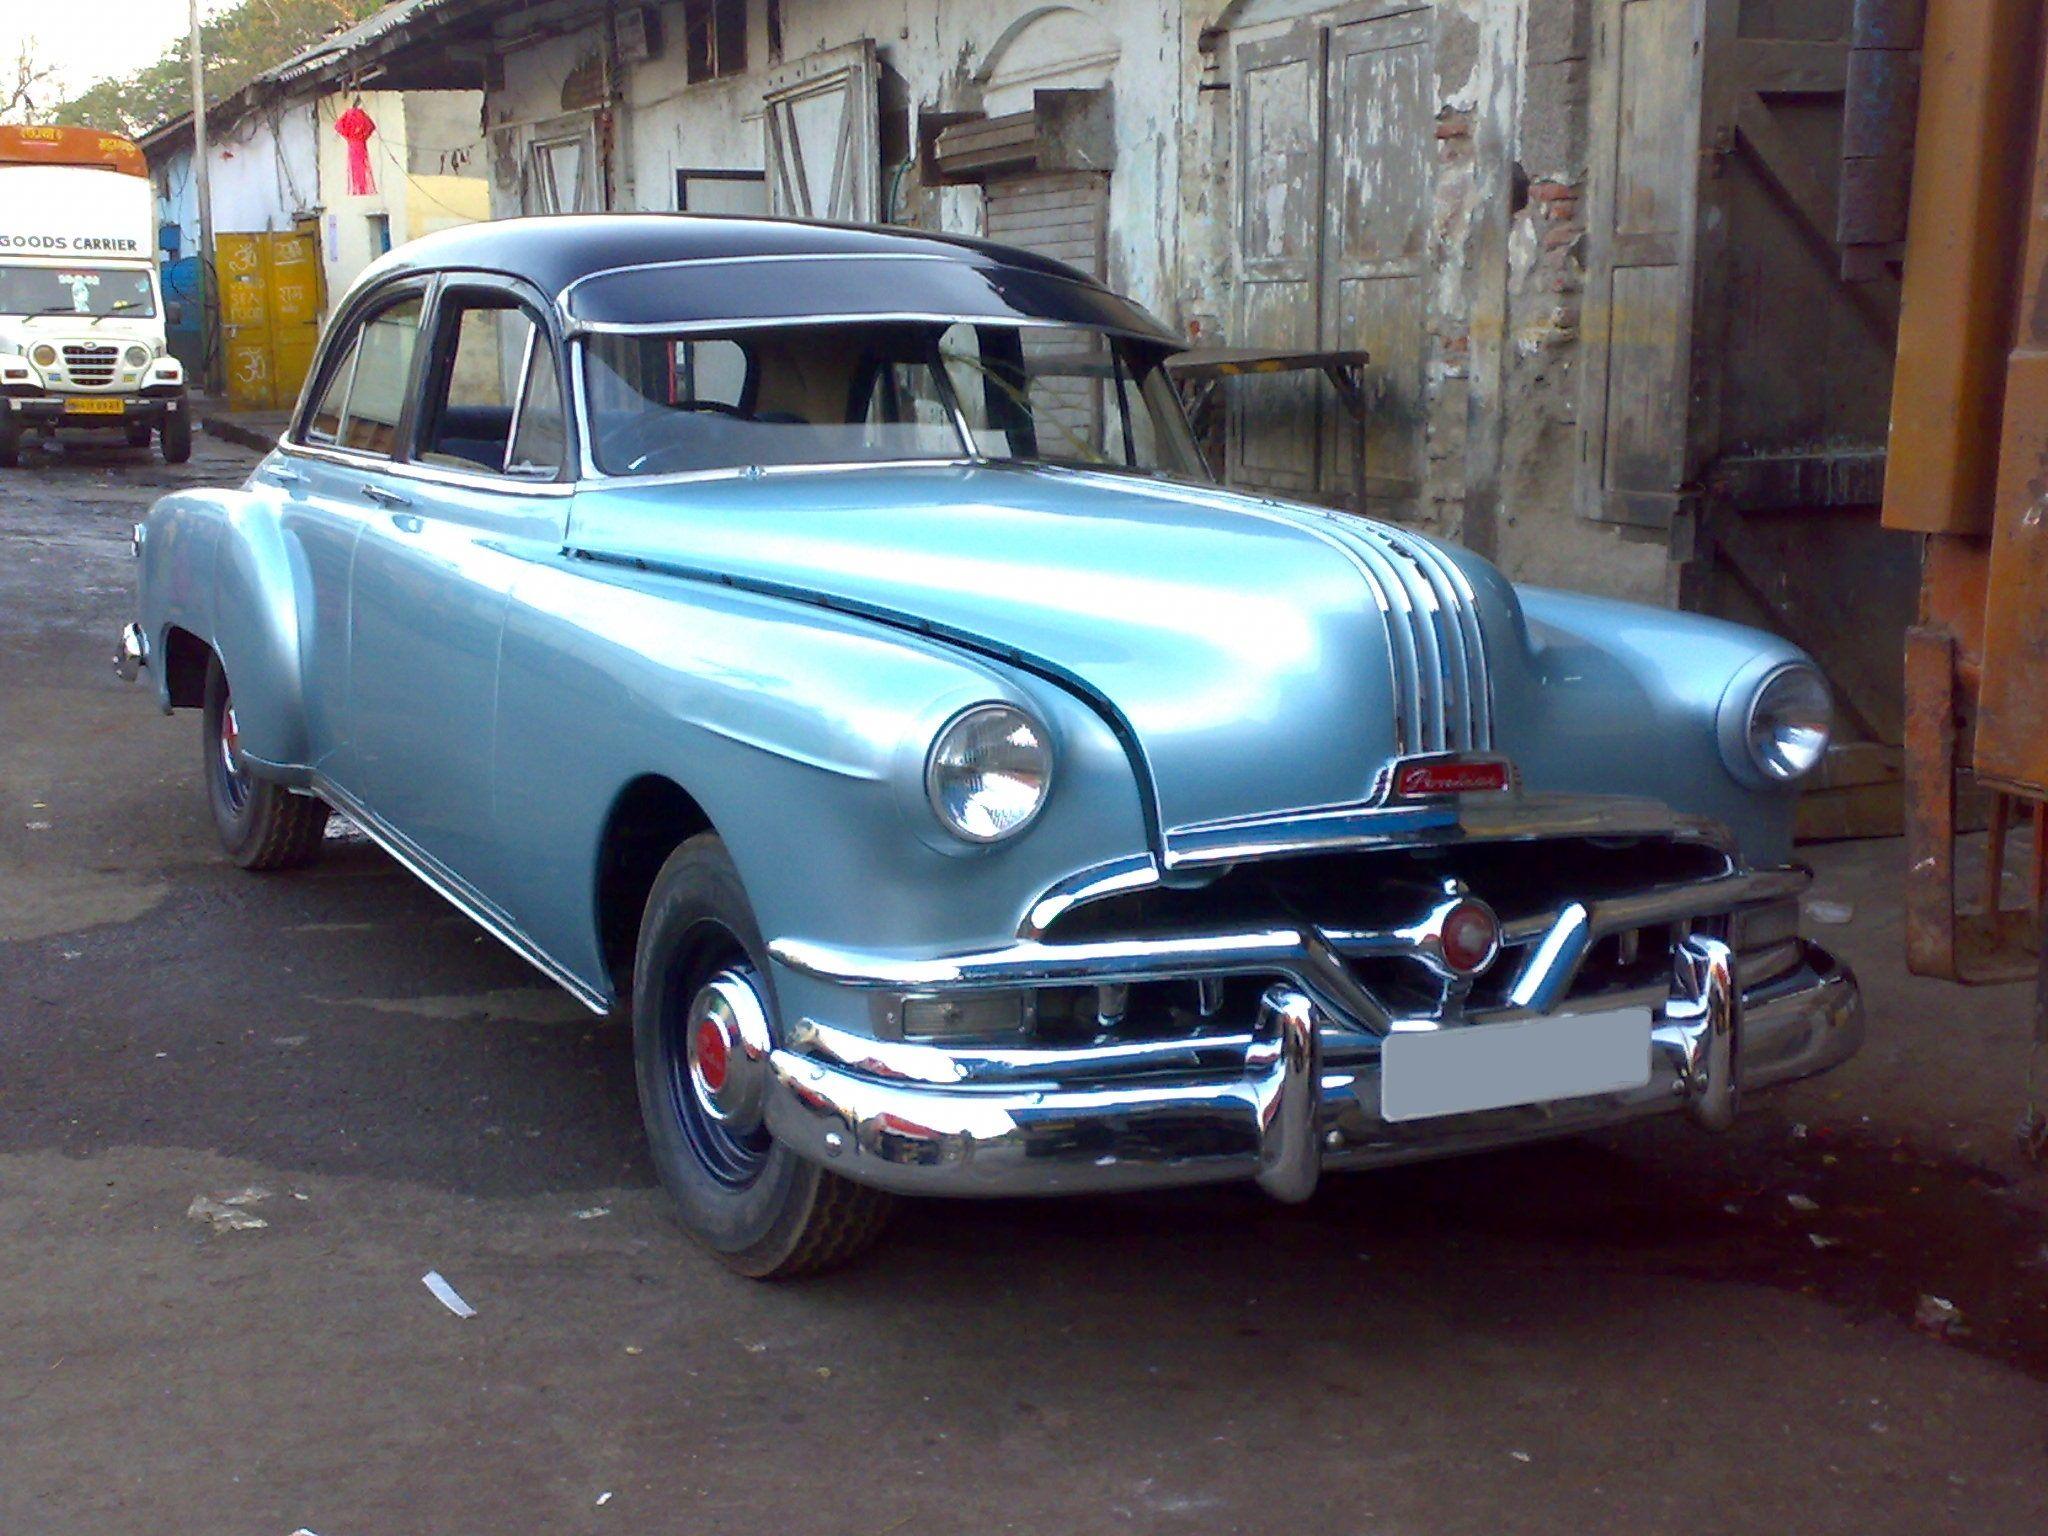 Classic car for Rent in Mumbai visit http://www.kingsofcarhire.in ...